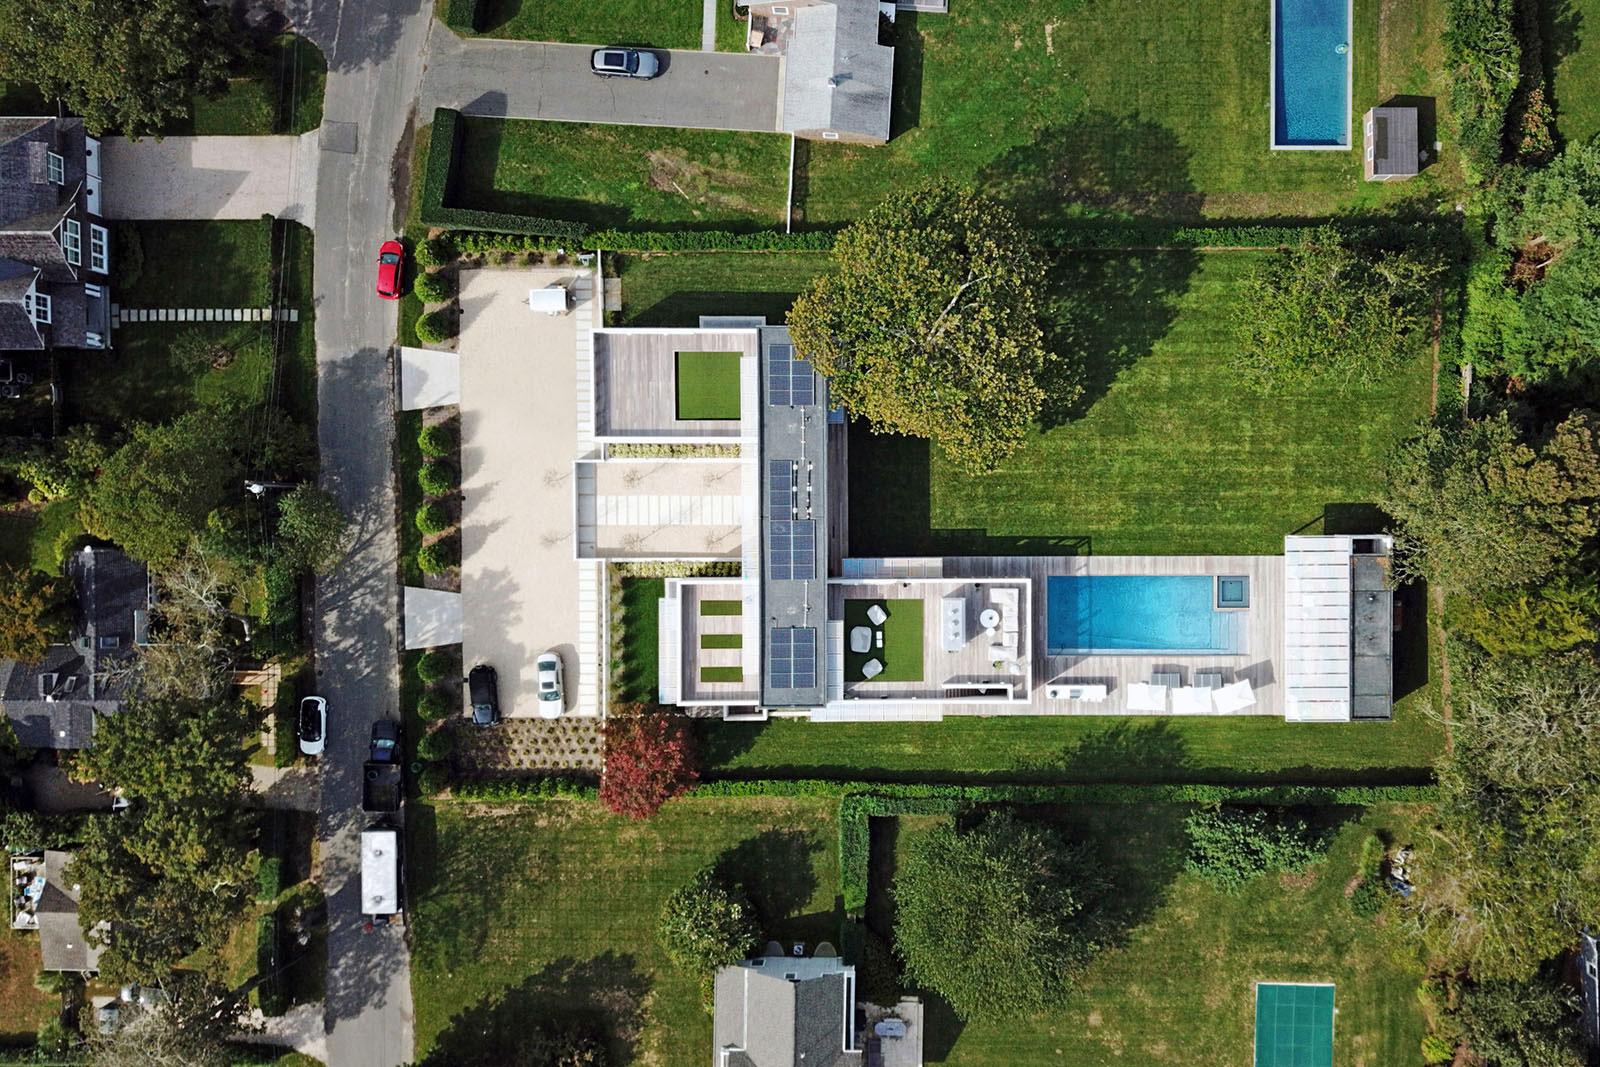 29-re4a-resolution-4-architecture-modern-modular-prefab-bridgehampton house-exterior-aerial.jpg